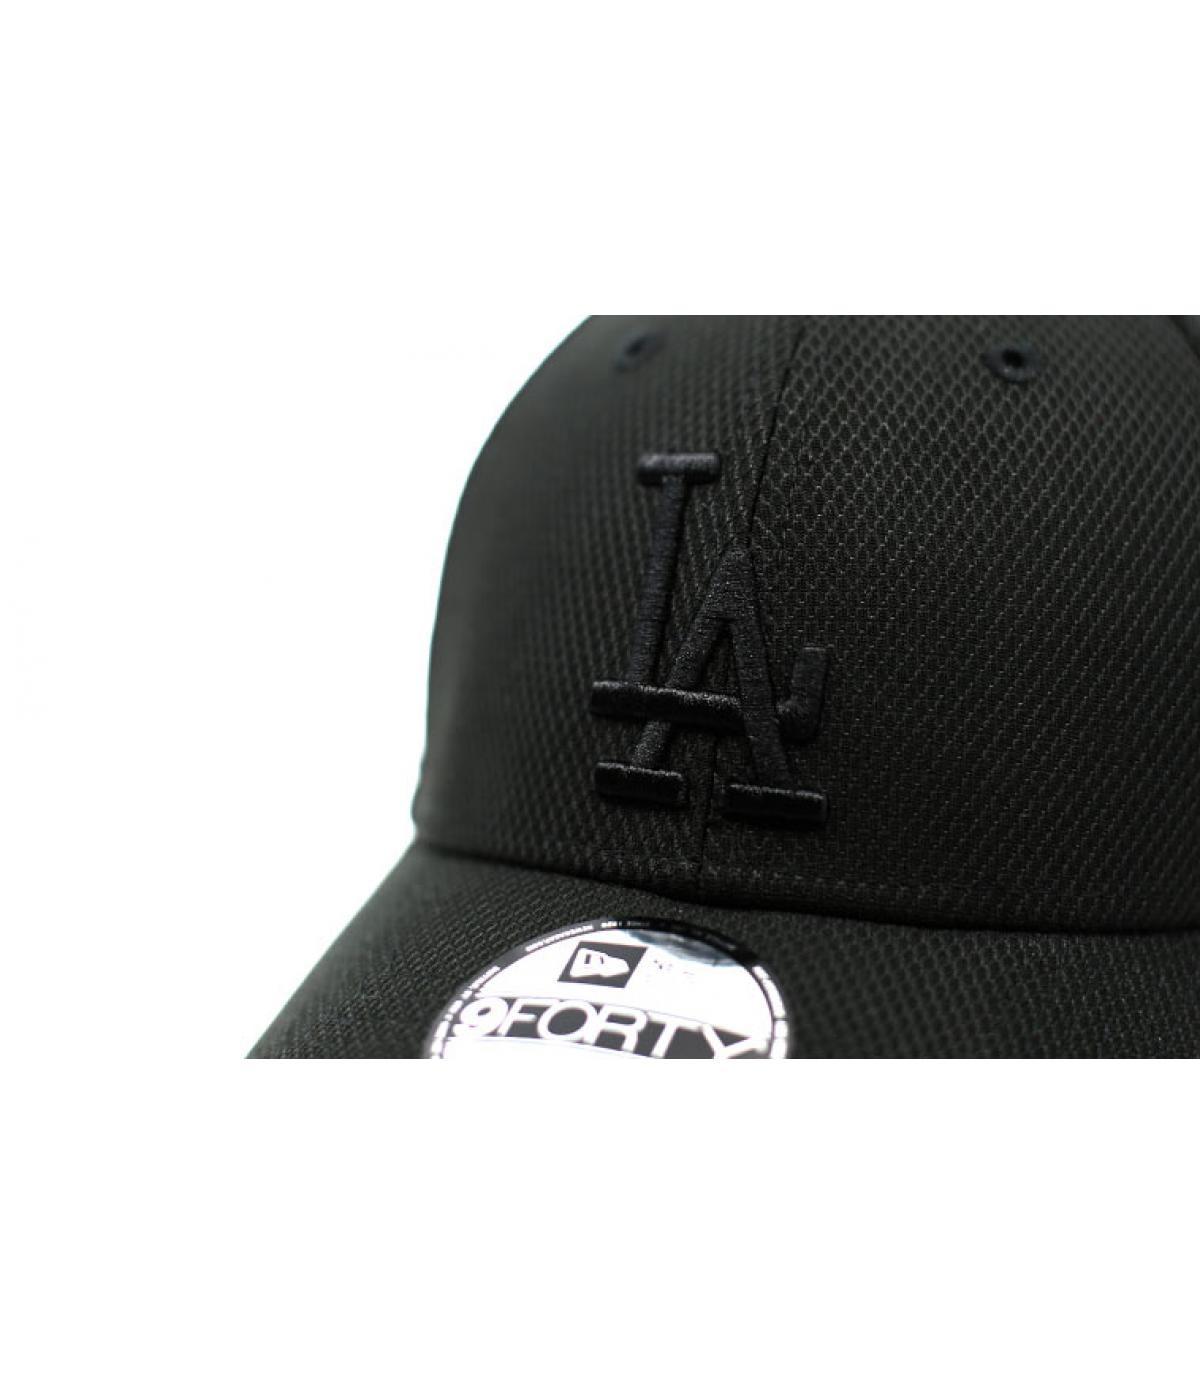 Details Cap Diamond Era 9Forty LA black - Abbildung 3